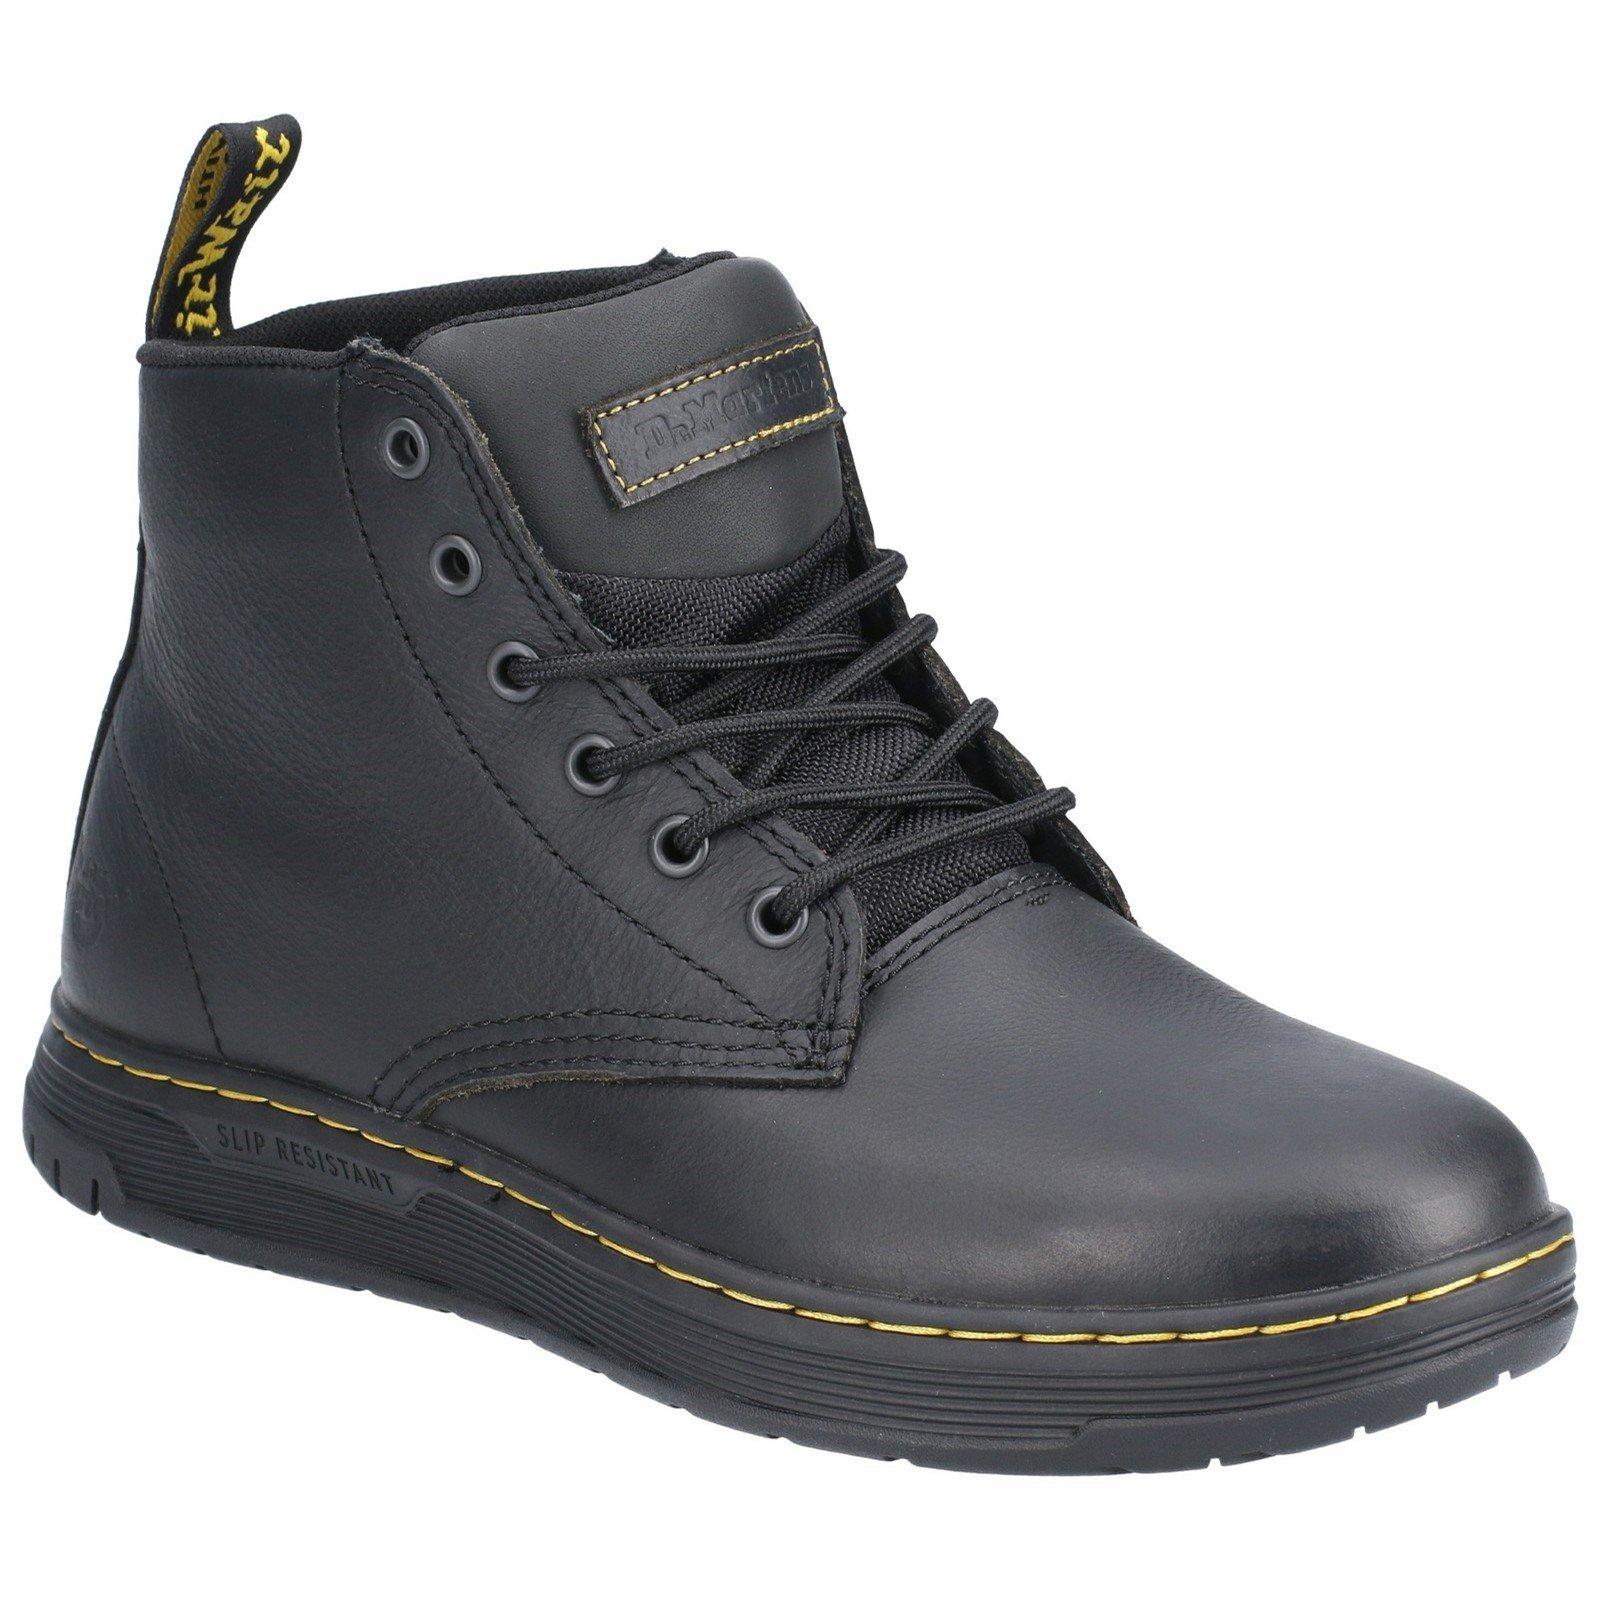 Dr Martens Men's Amwell Slip Resistant Leather Boot Black 29508 - Black 11